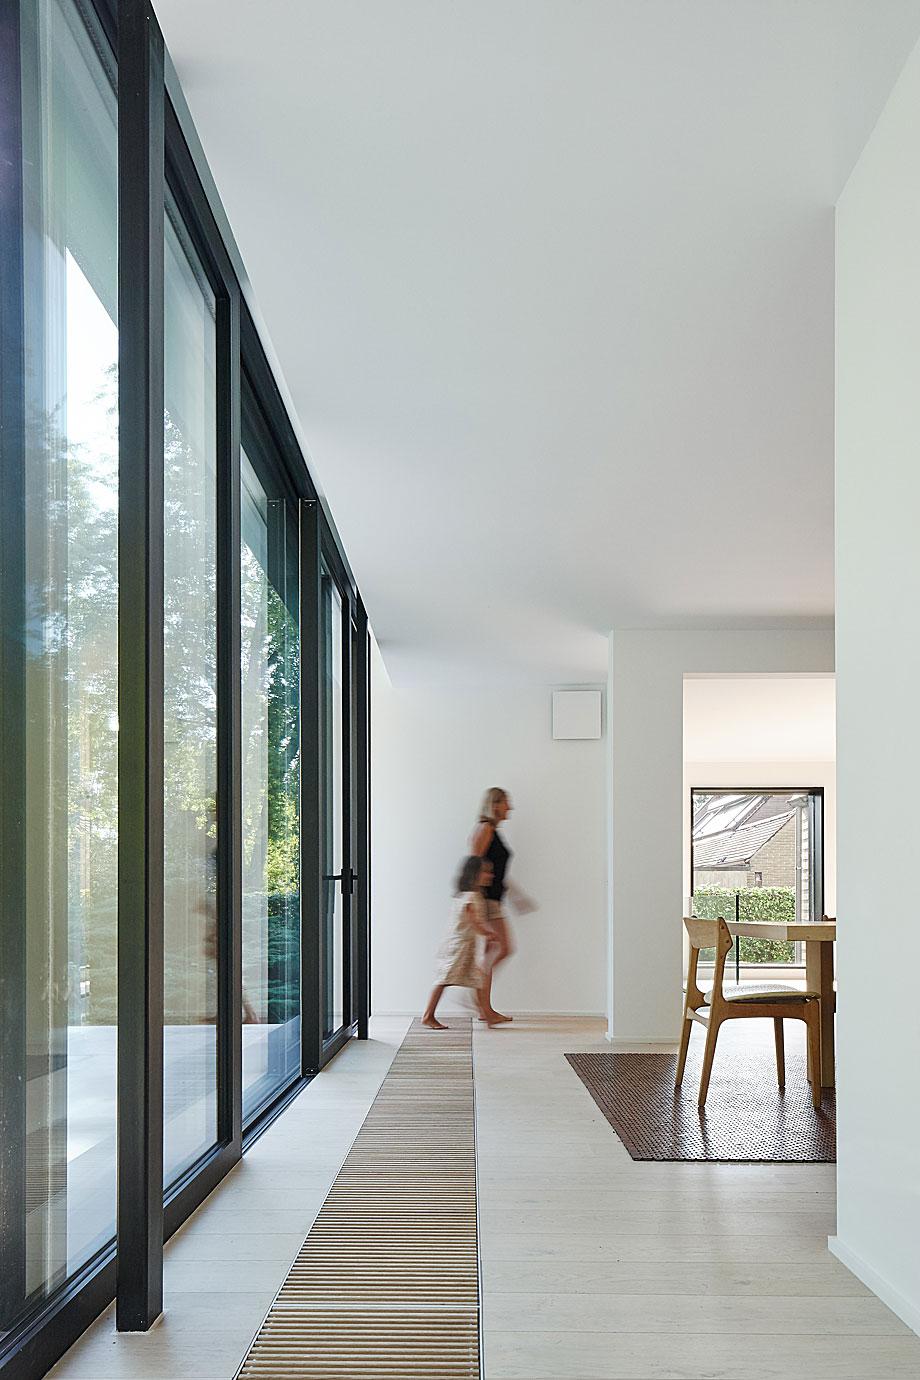 villa-flemish-martens-brunet-etie-dennis-de-smet-3